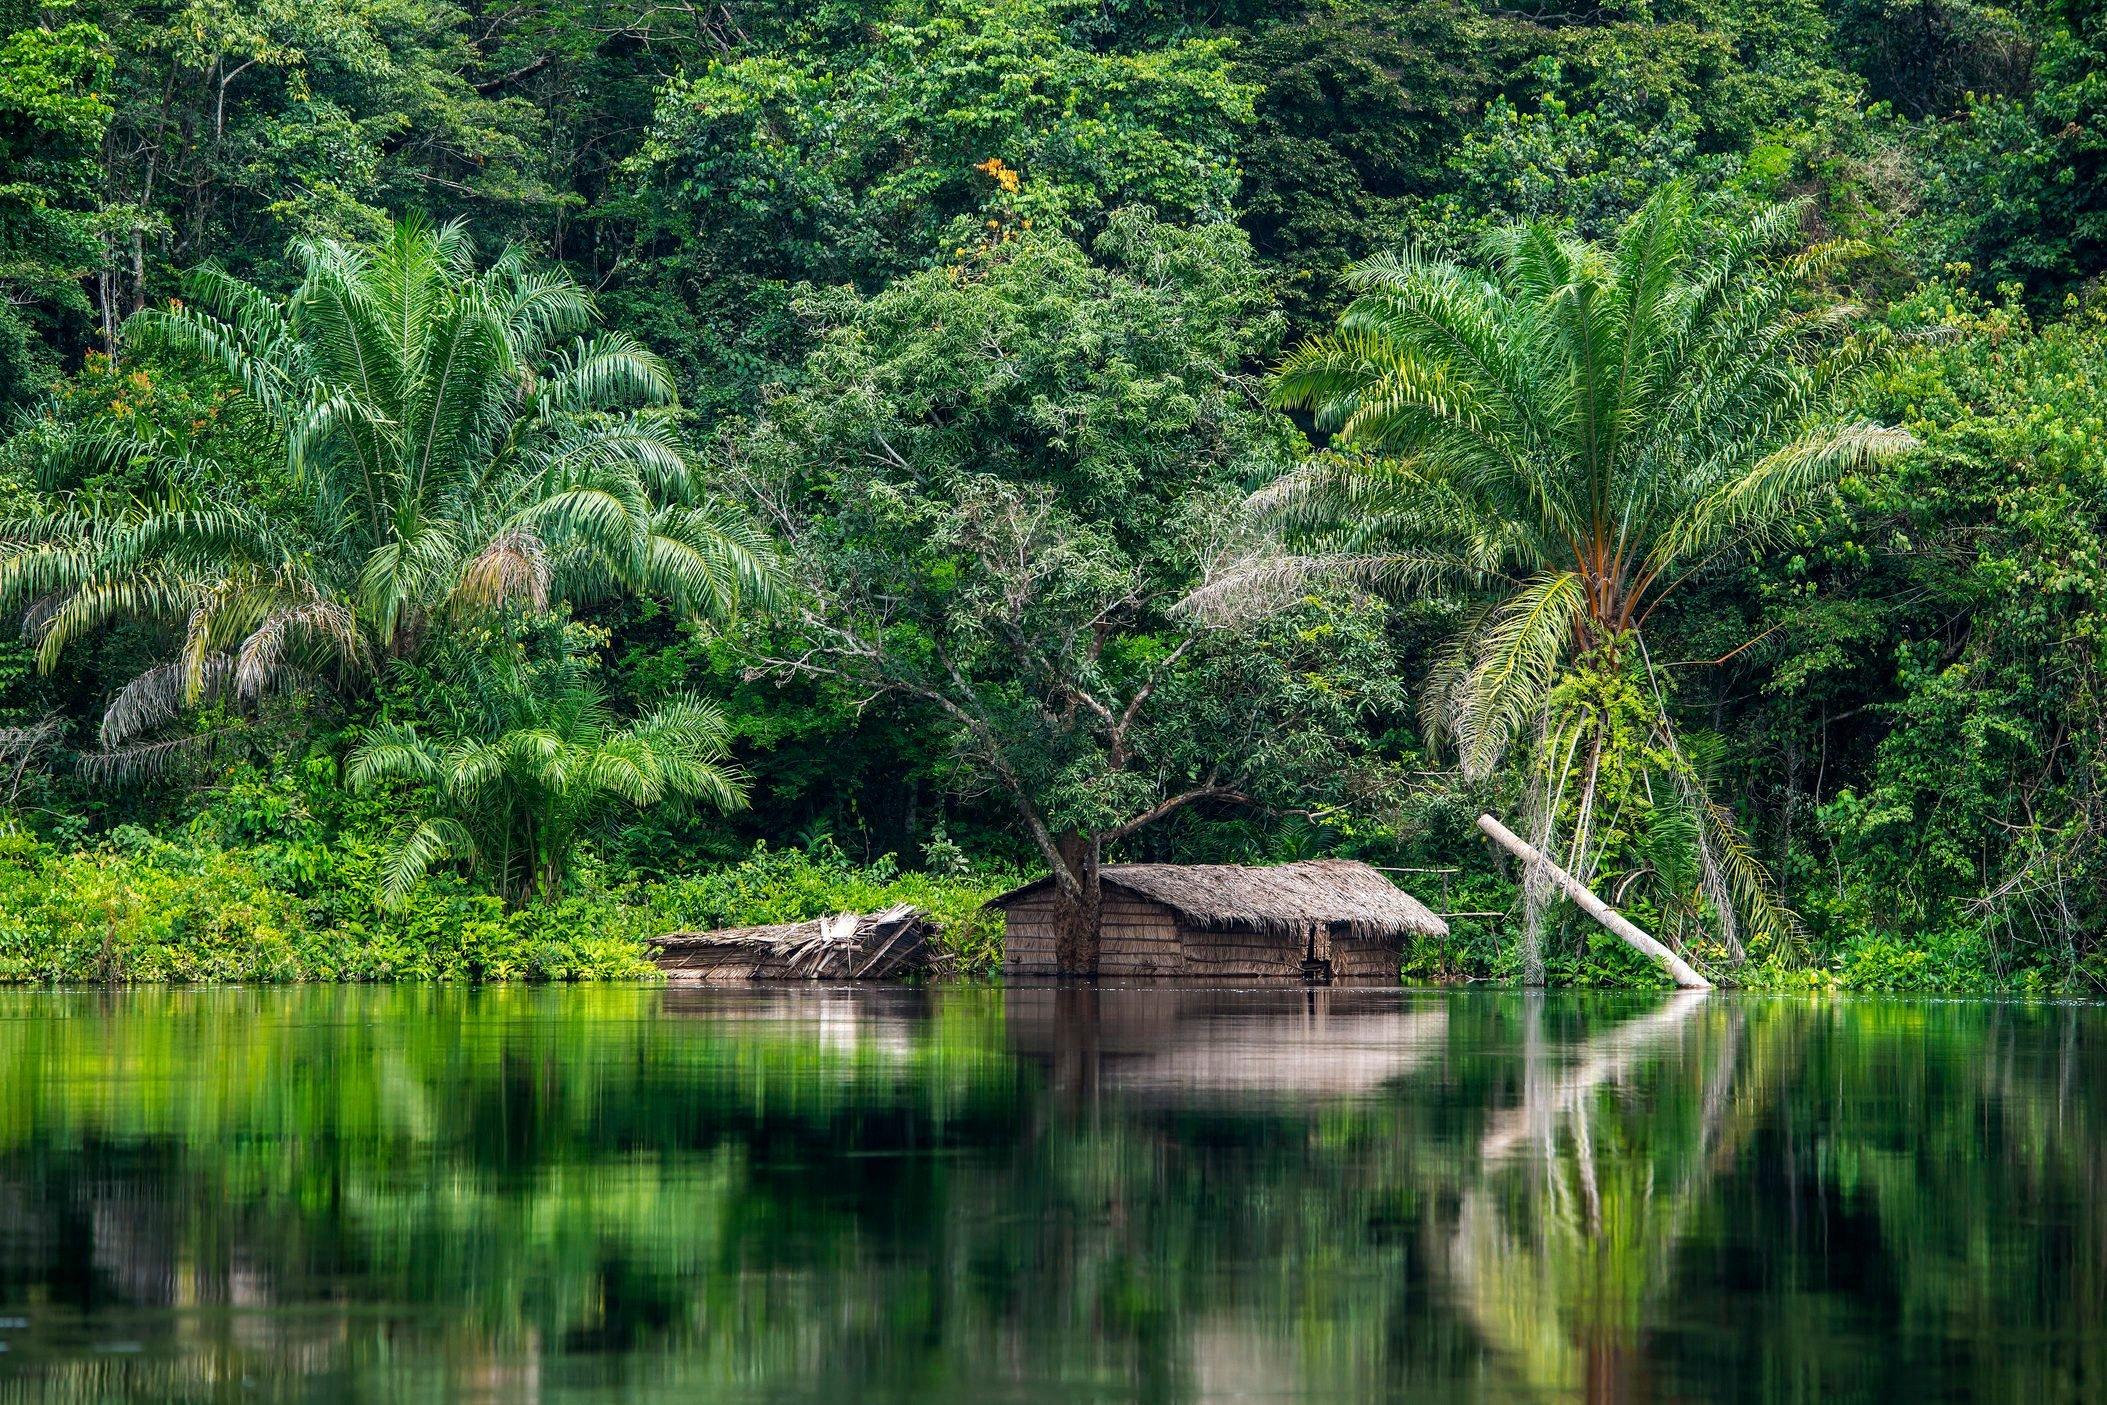 Hut at the shoreline of Congo River